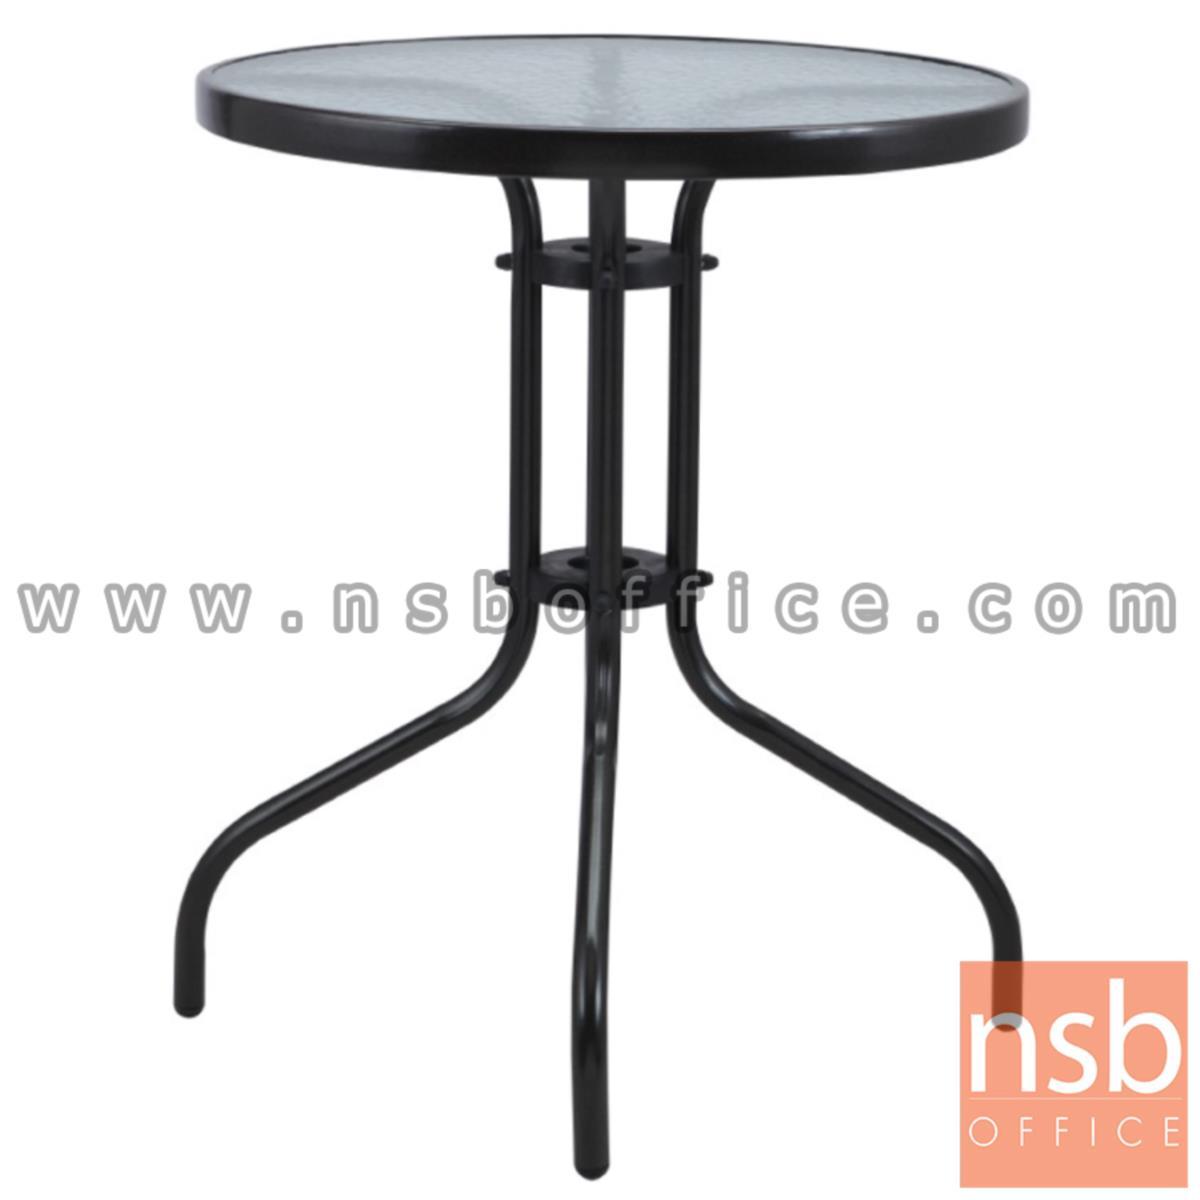 A09A058:โต๊ะสนามหน้ากลมกระจกฝ้า รุ่น Hourglass (อาวร์กลาส) ขนาด 60W* 60D* 70H cm. โครงเหล็กพ่นดำ